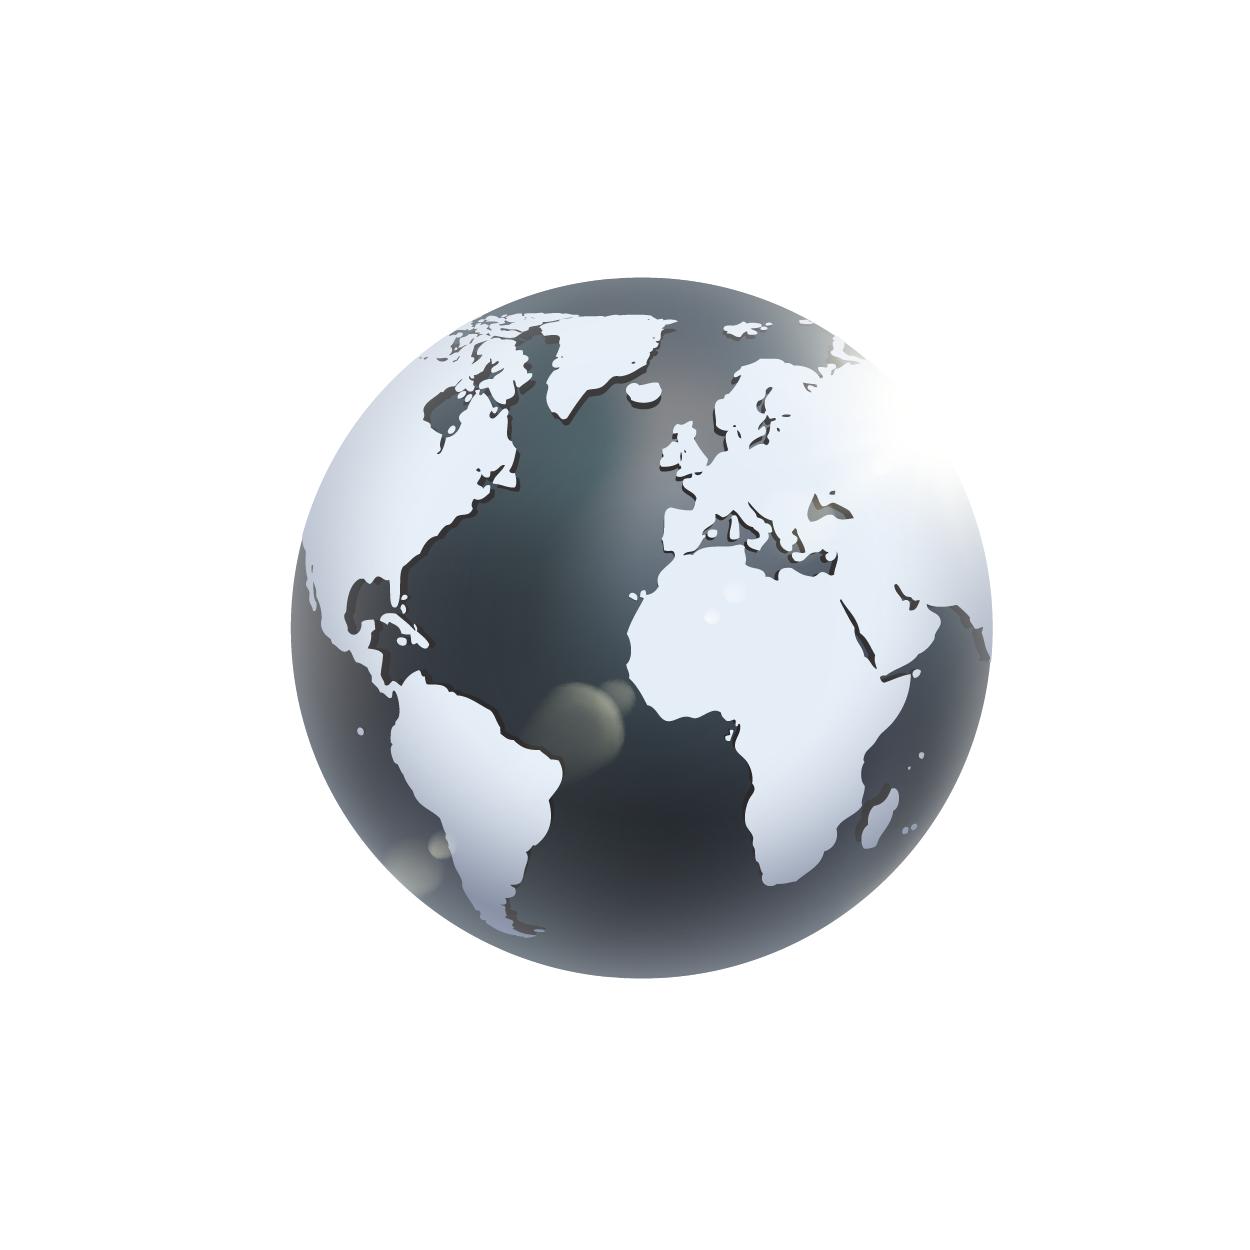 Global-image-3-01-01.png